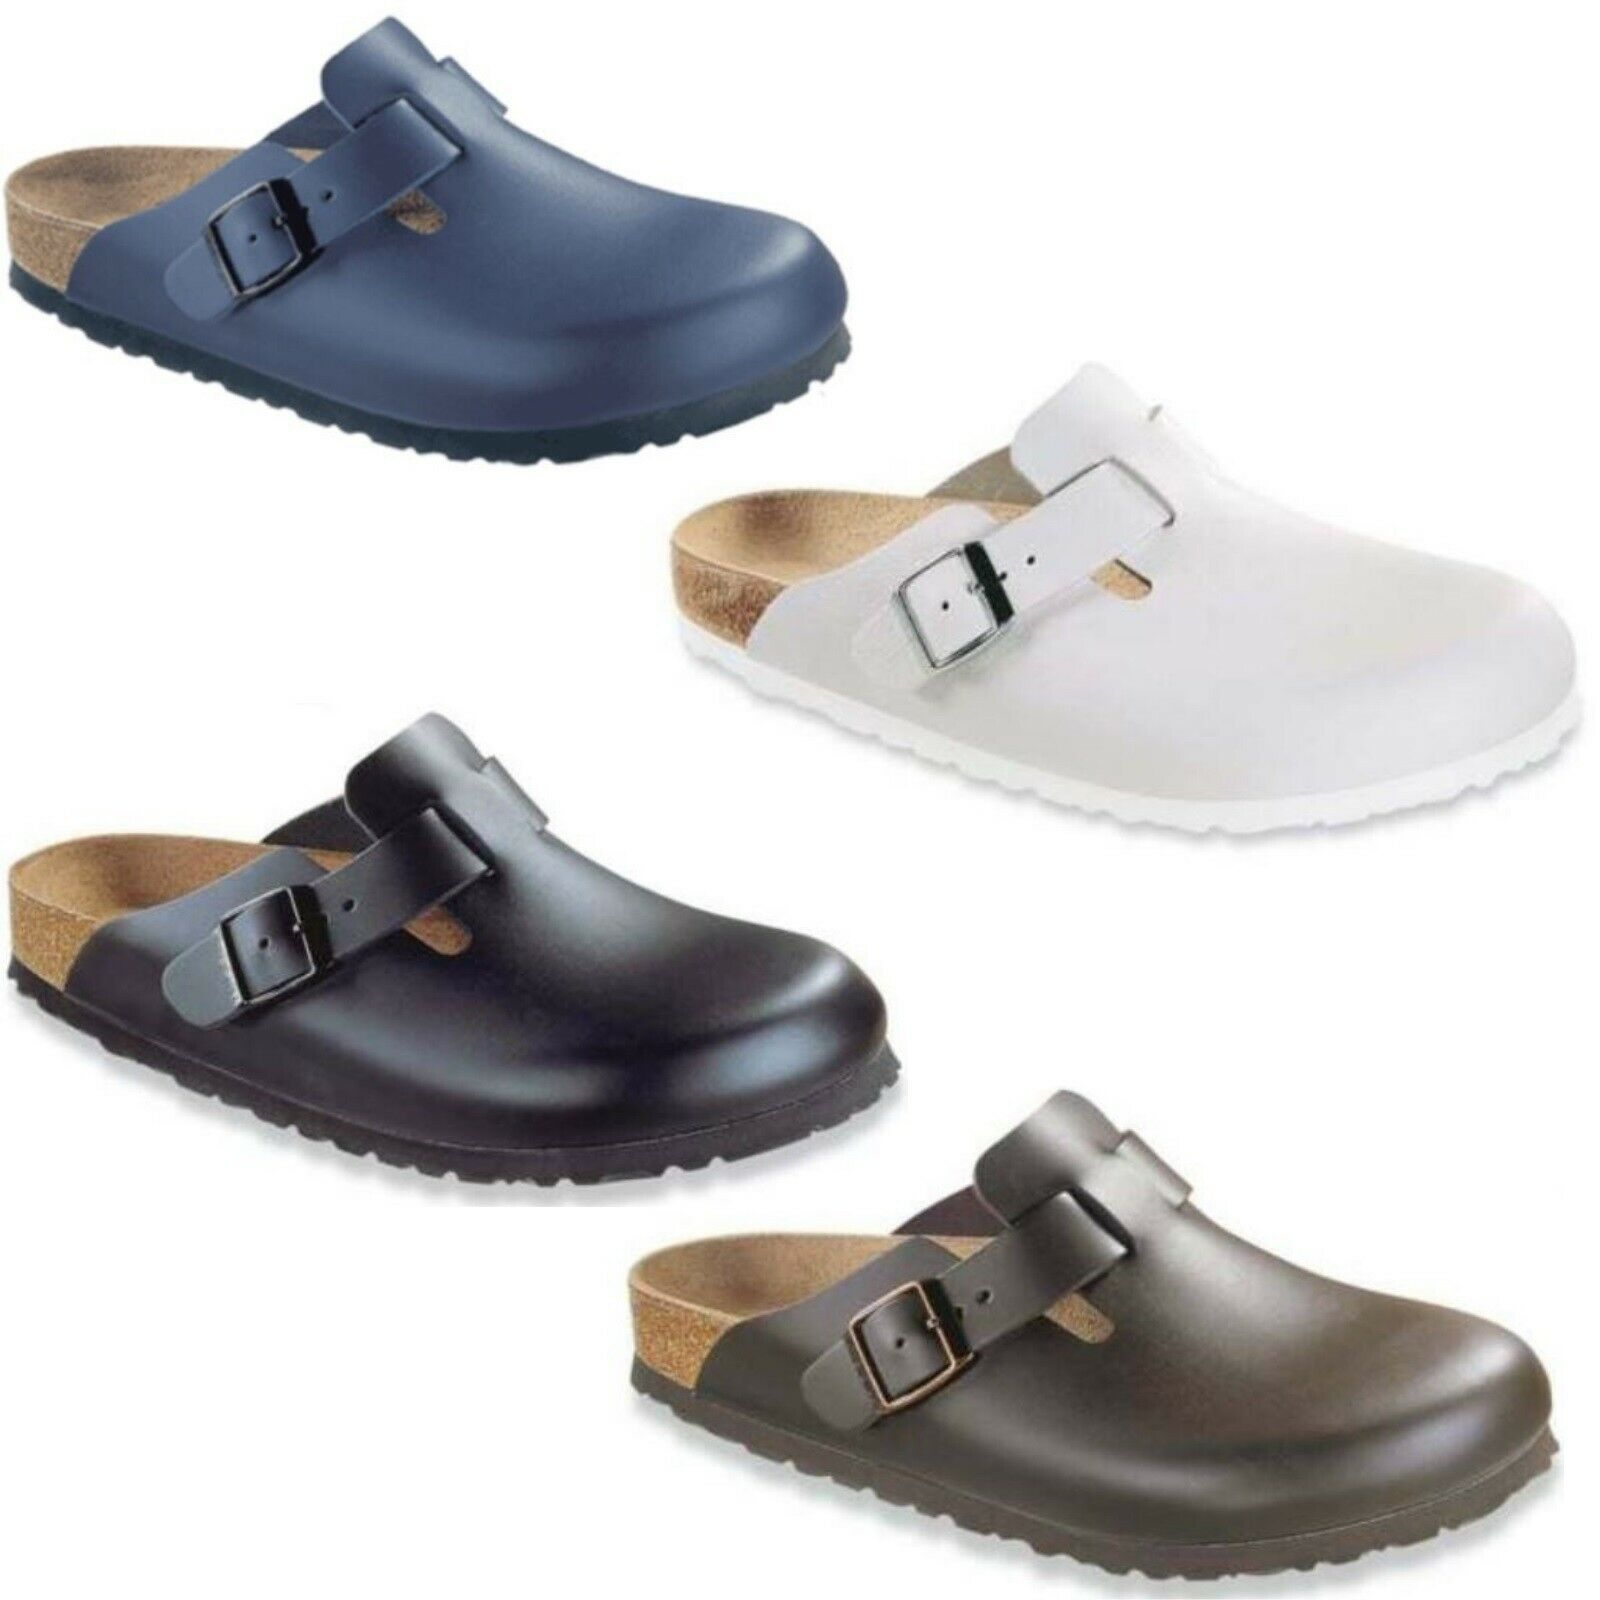 Birkenstock BOSTON Leder Schuhe Damen Herren Clogs